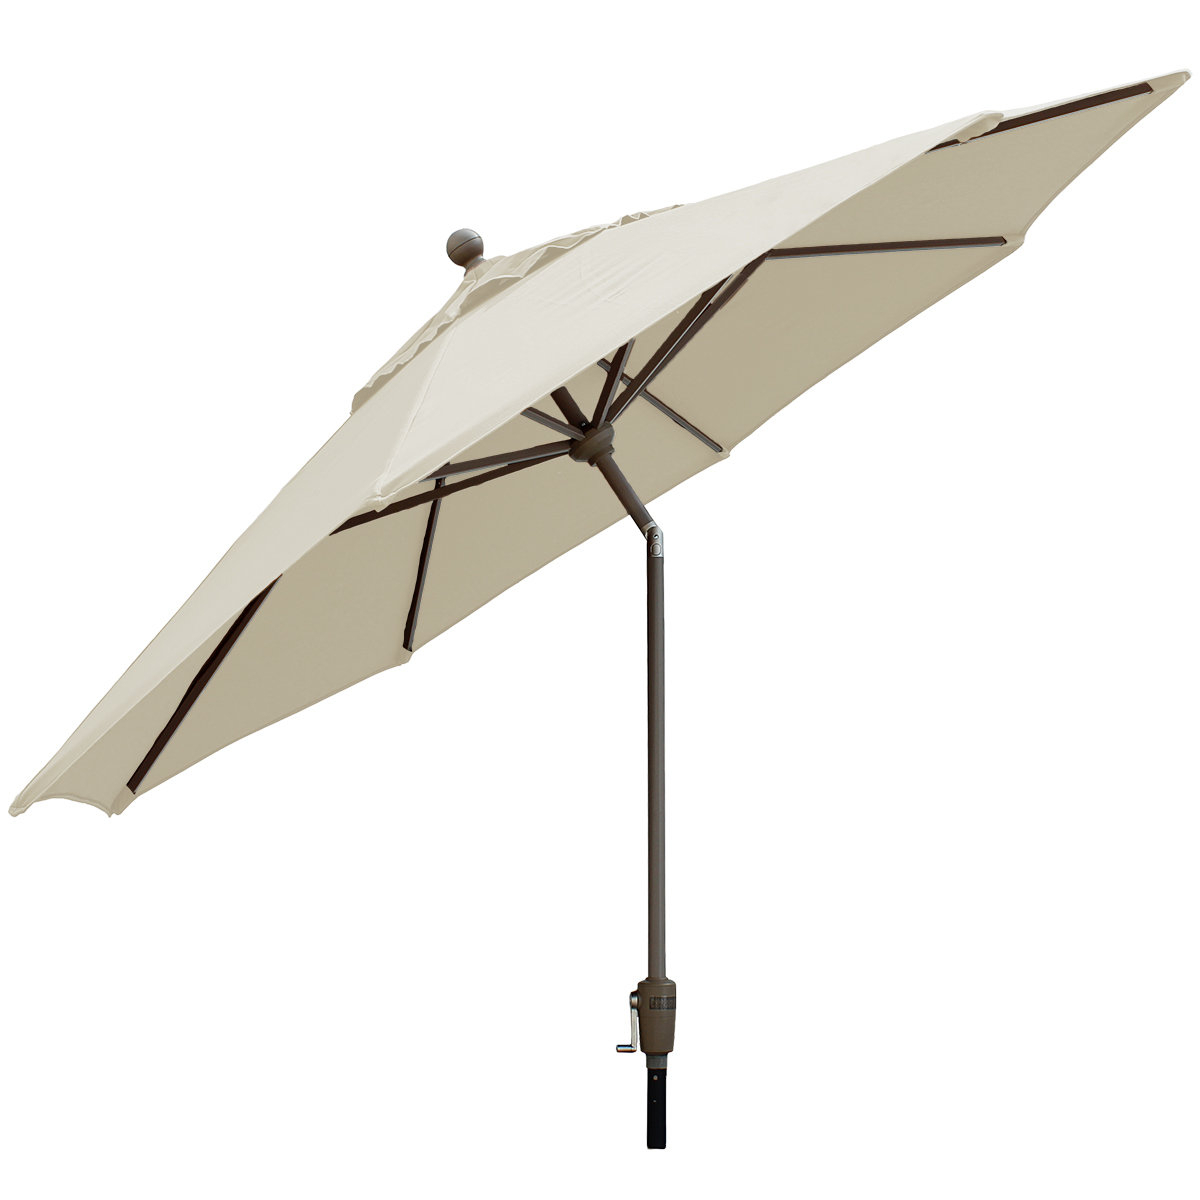 Markley Market Beach Umbrellas Regarding Most Up To Date Crowland 9' Market Sunbrella Umbrella (View 7 of 20)